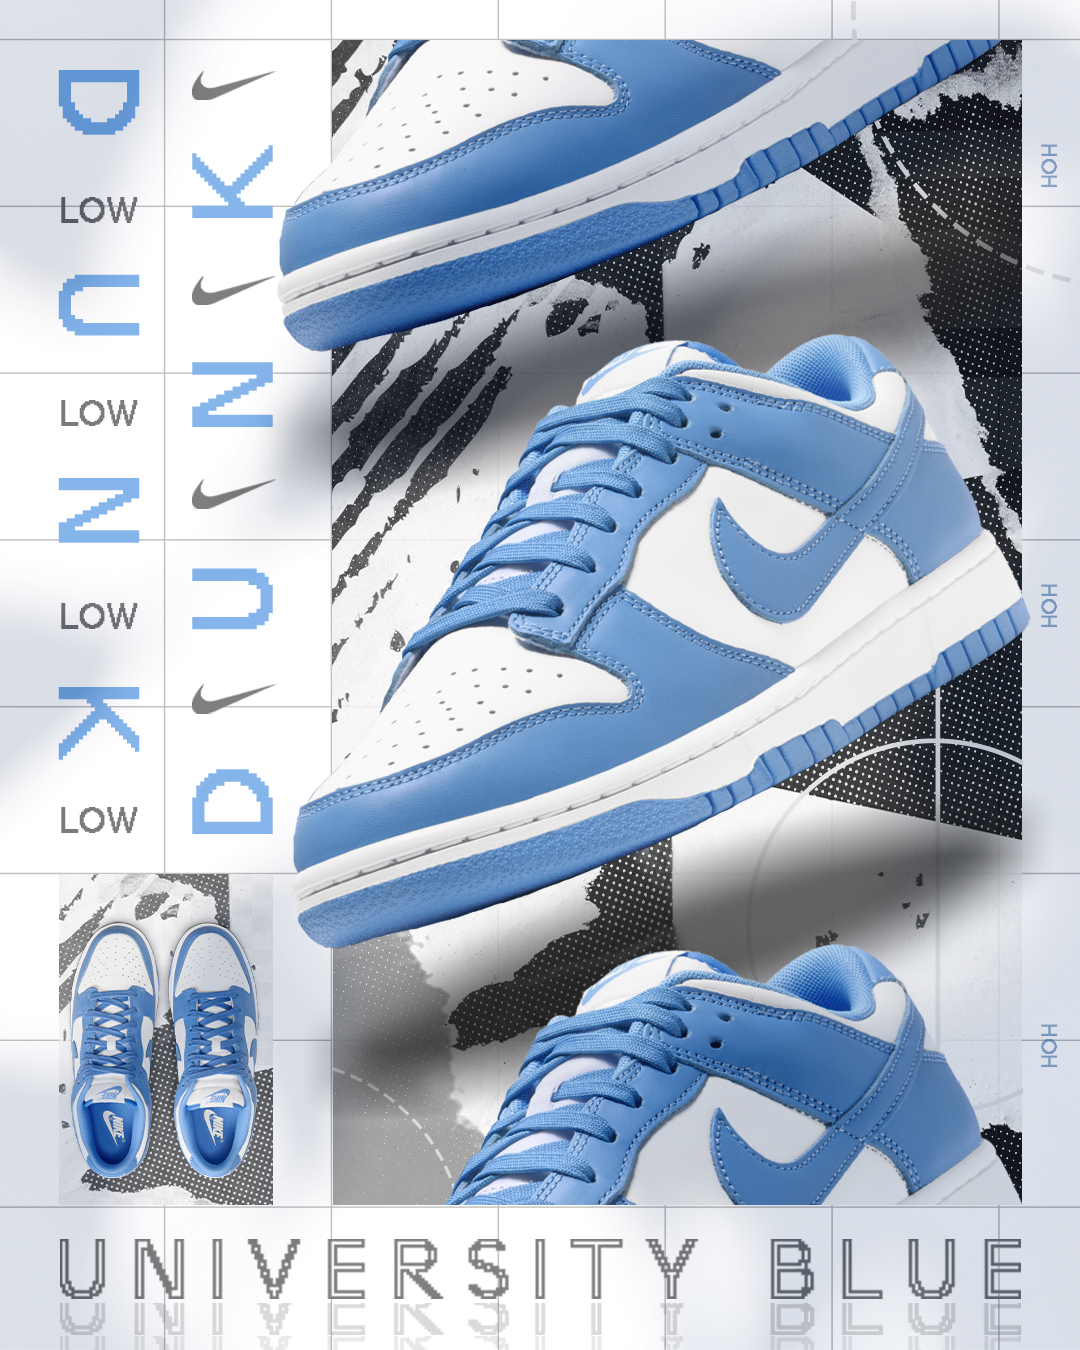 Nike-Dunk-Low-University-Blue-Invert